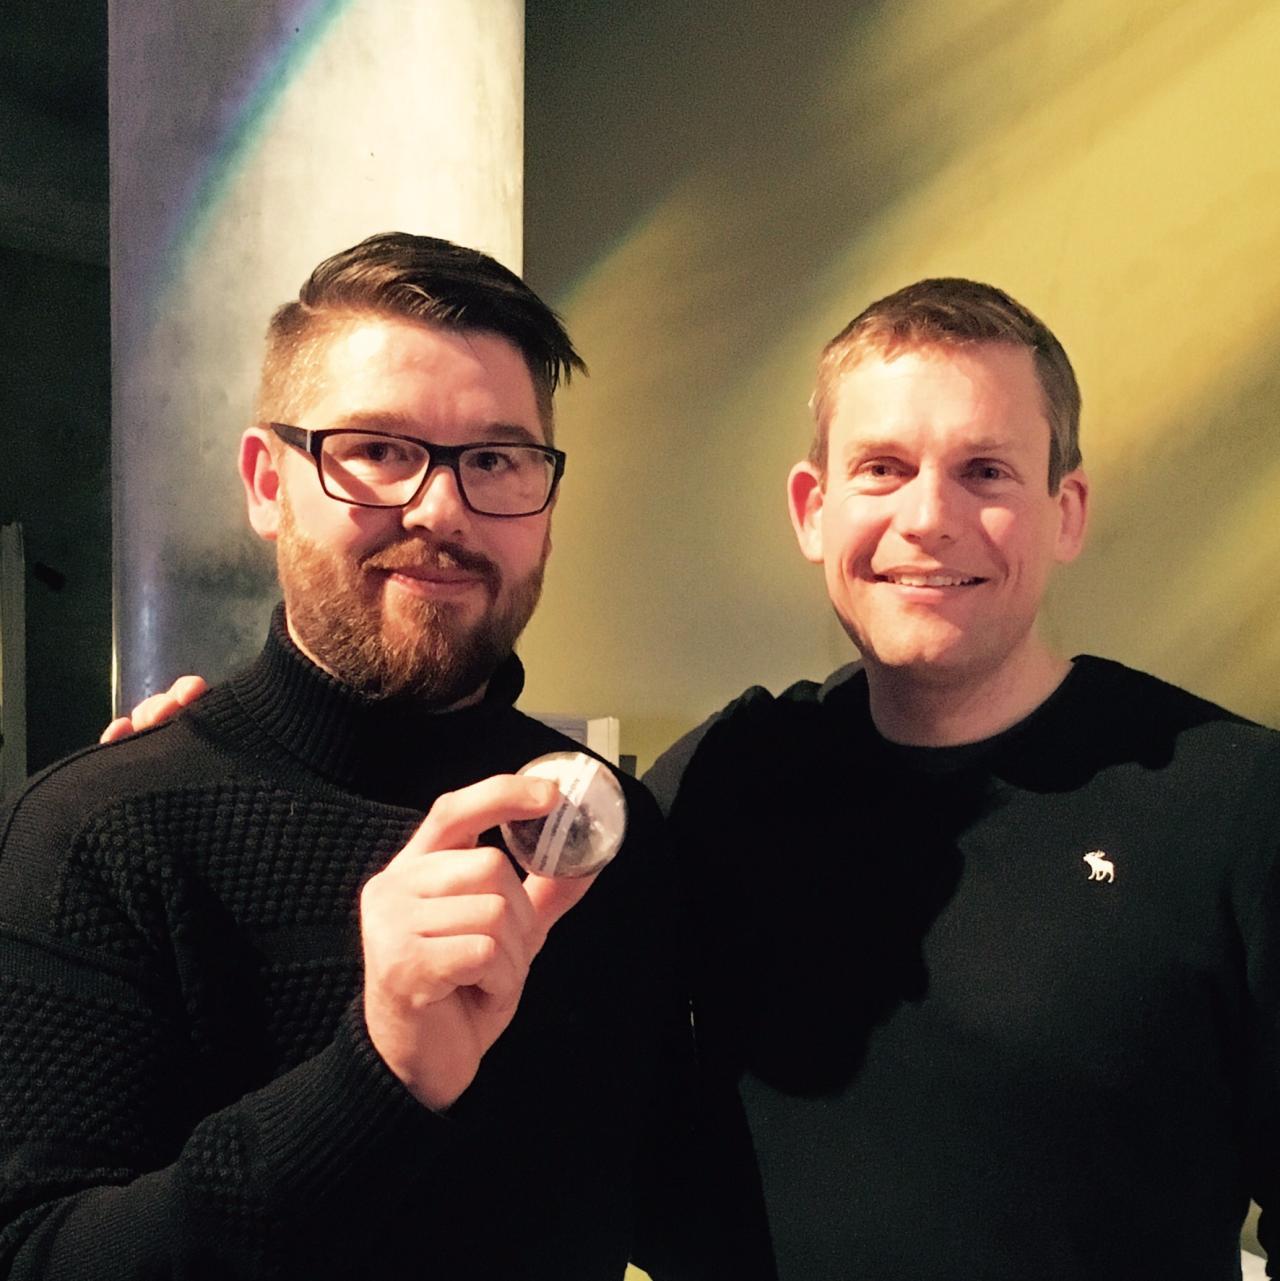 Palle Sørensen with the astronaut Andreas Mogensen